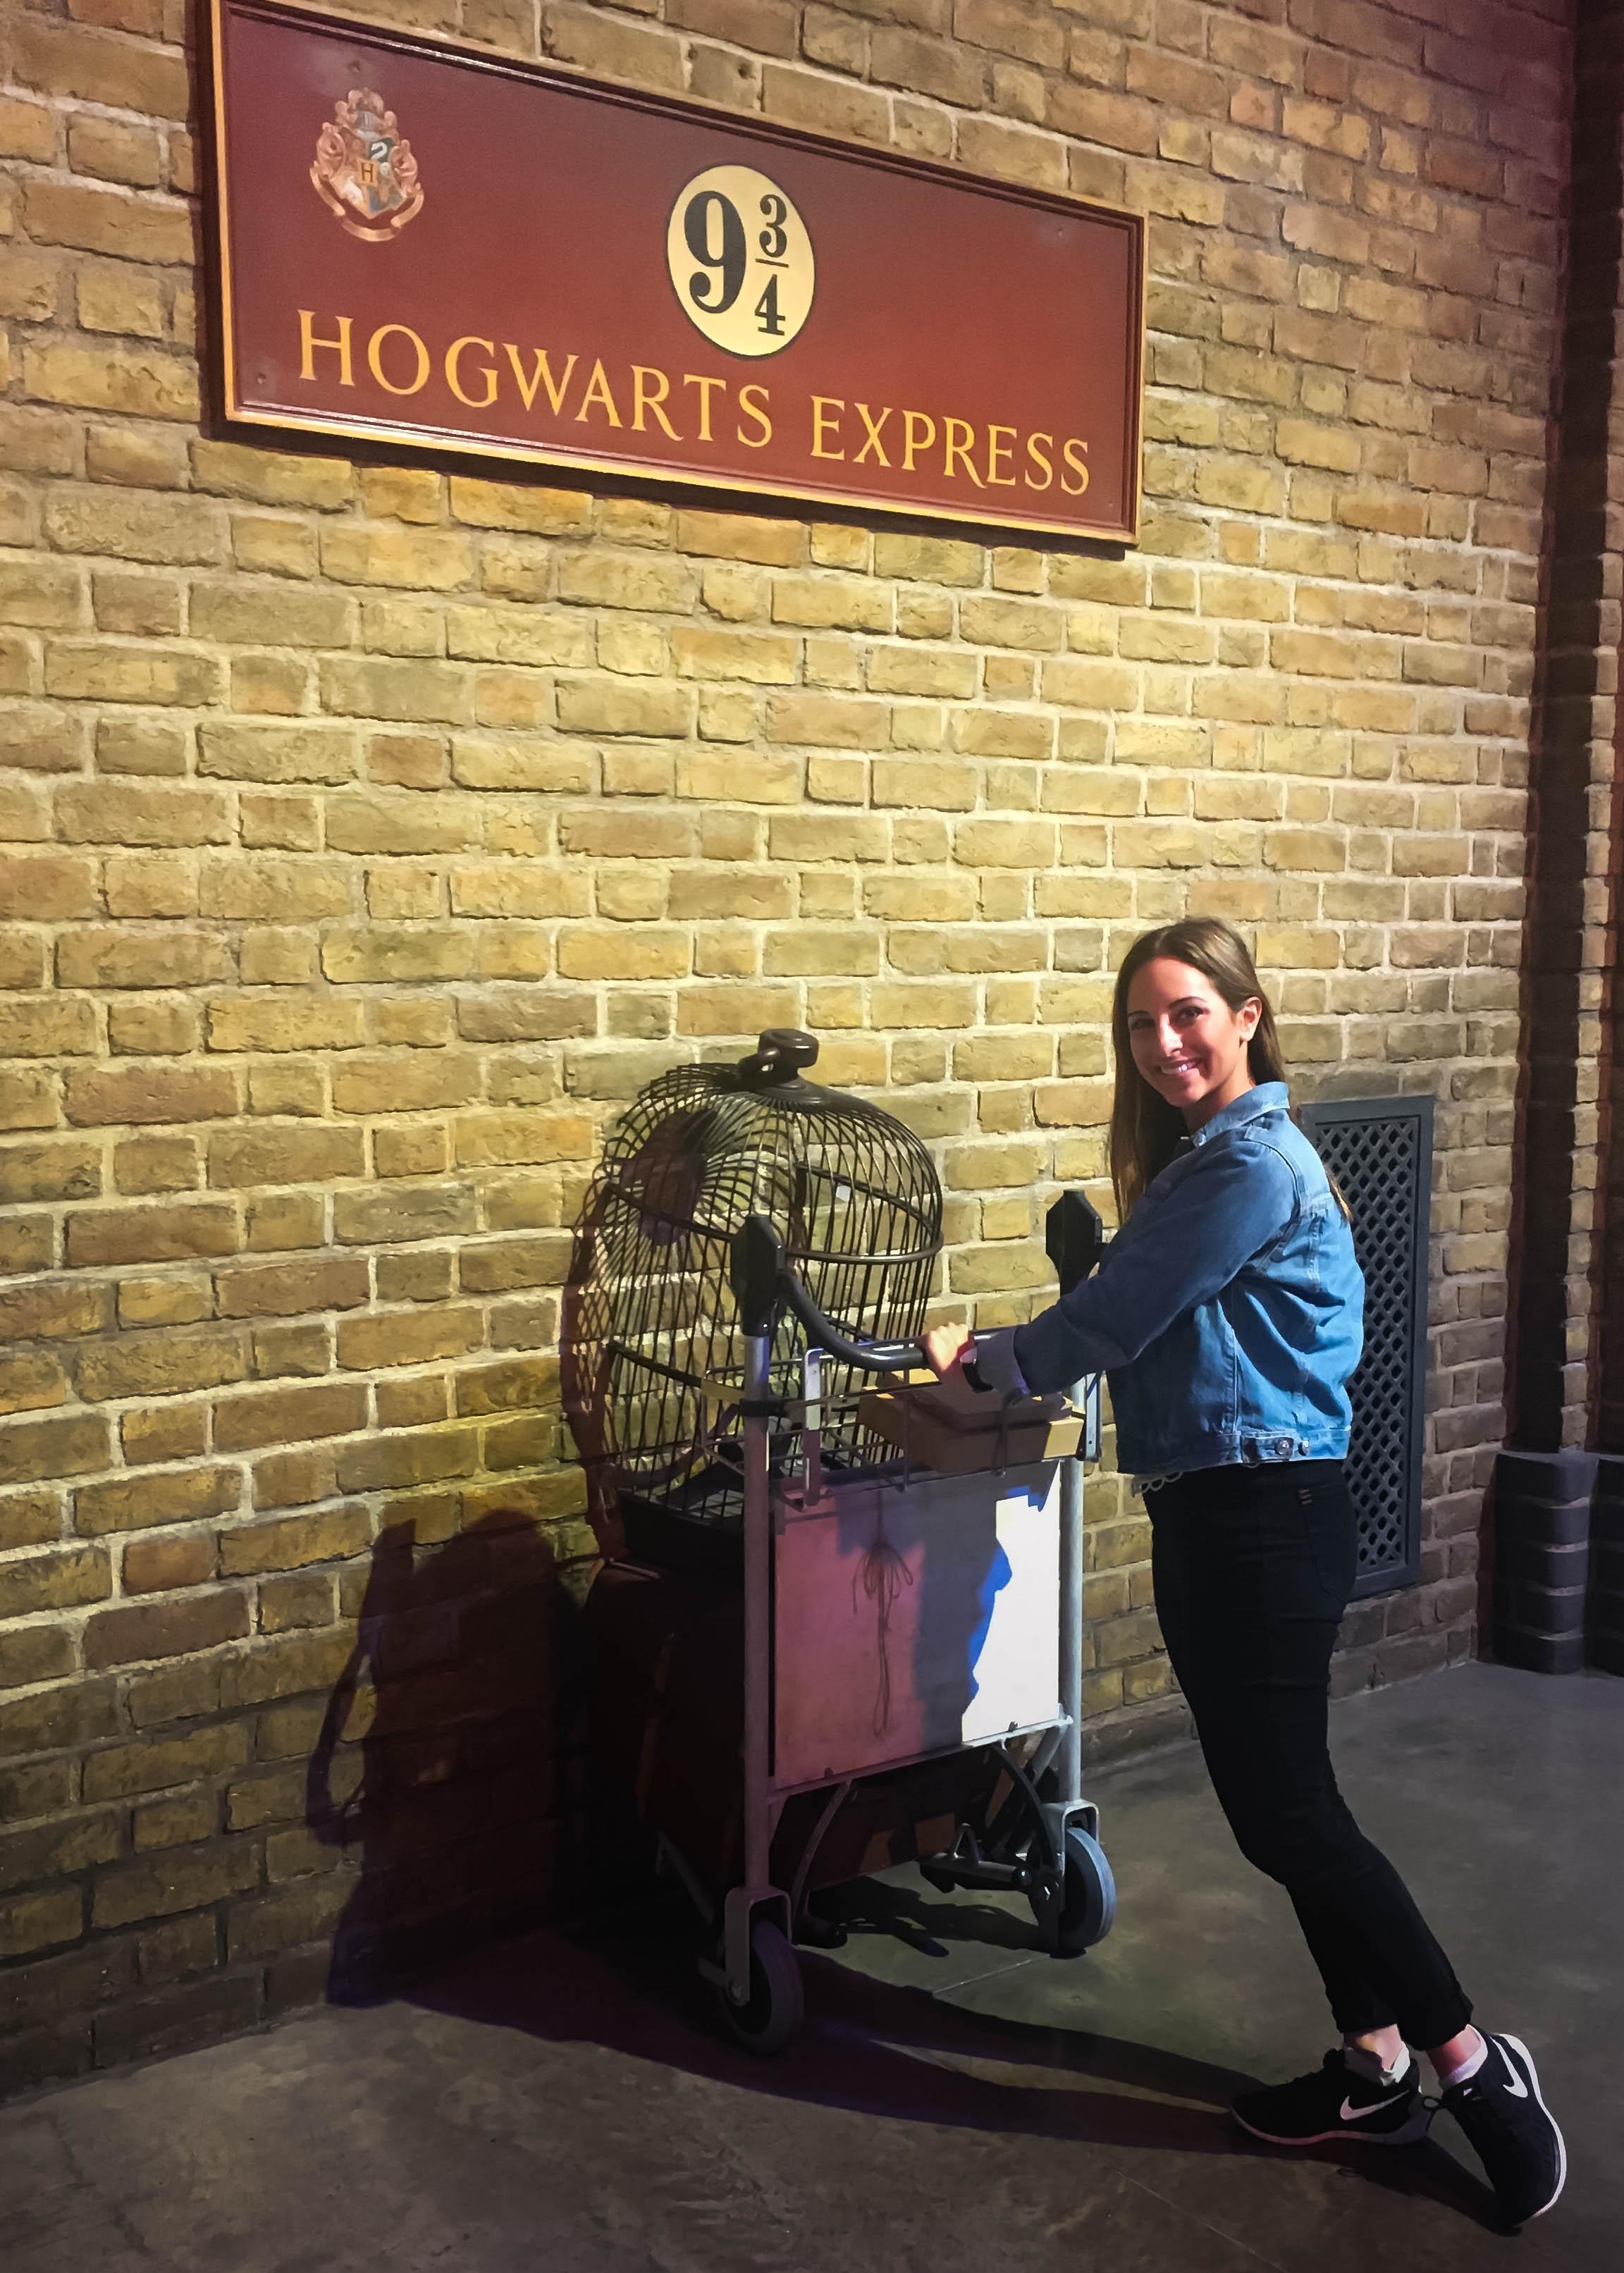 Hogwarts Express Harry Potter.jpg